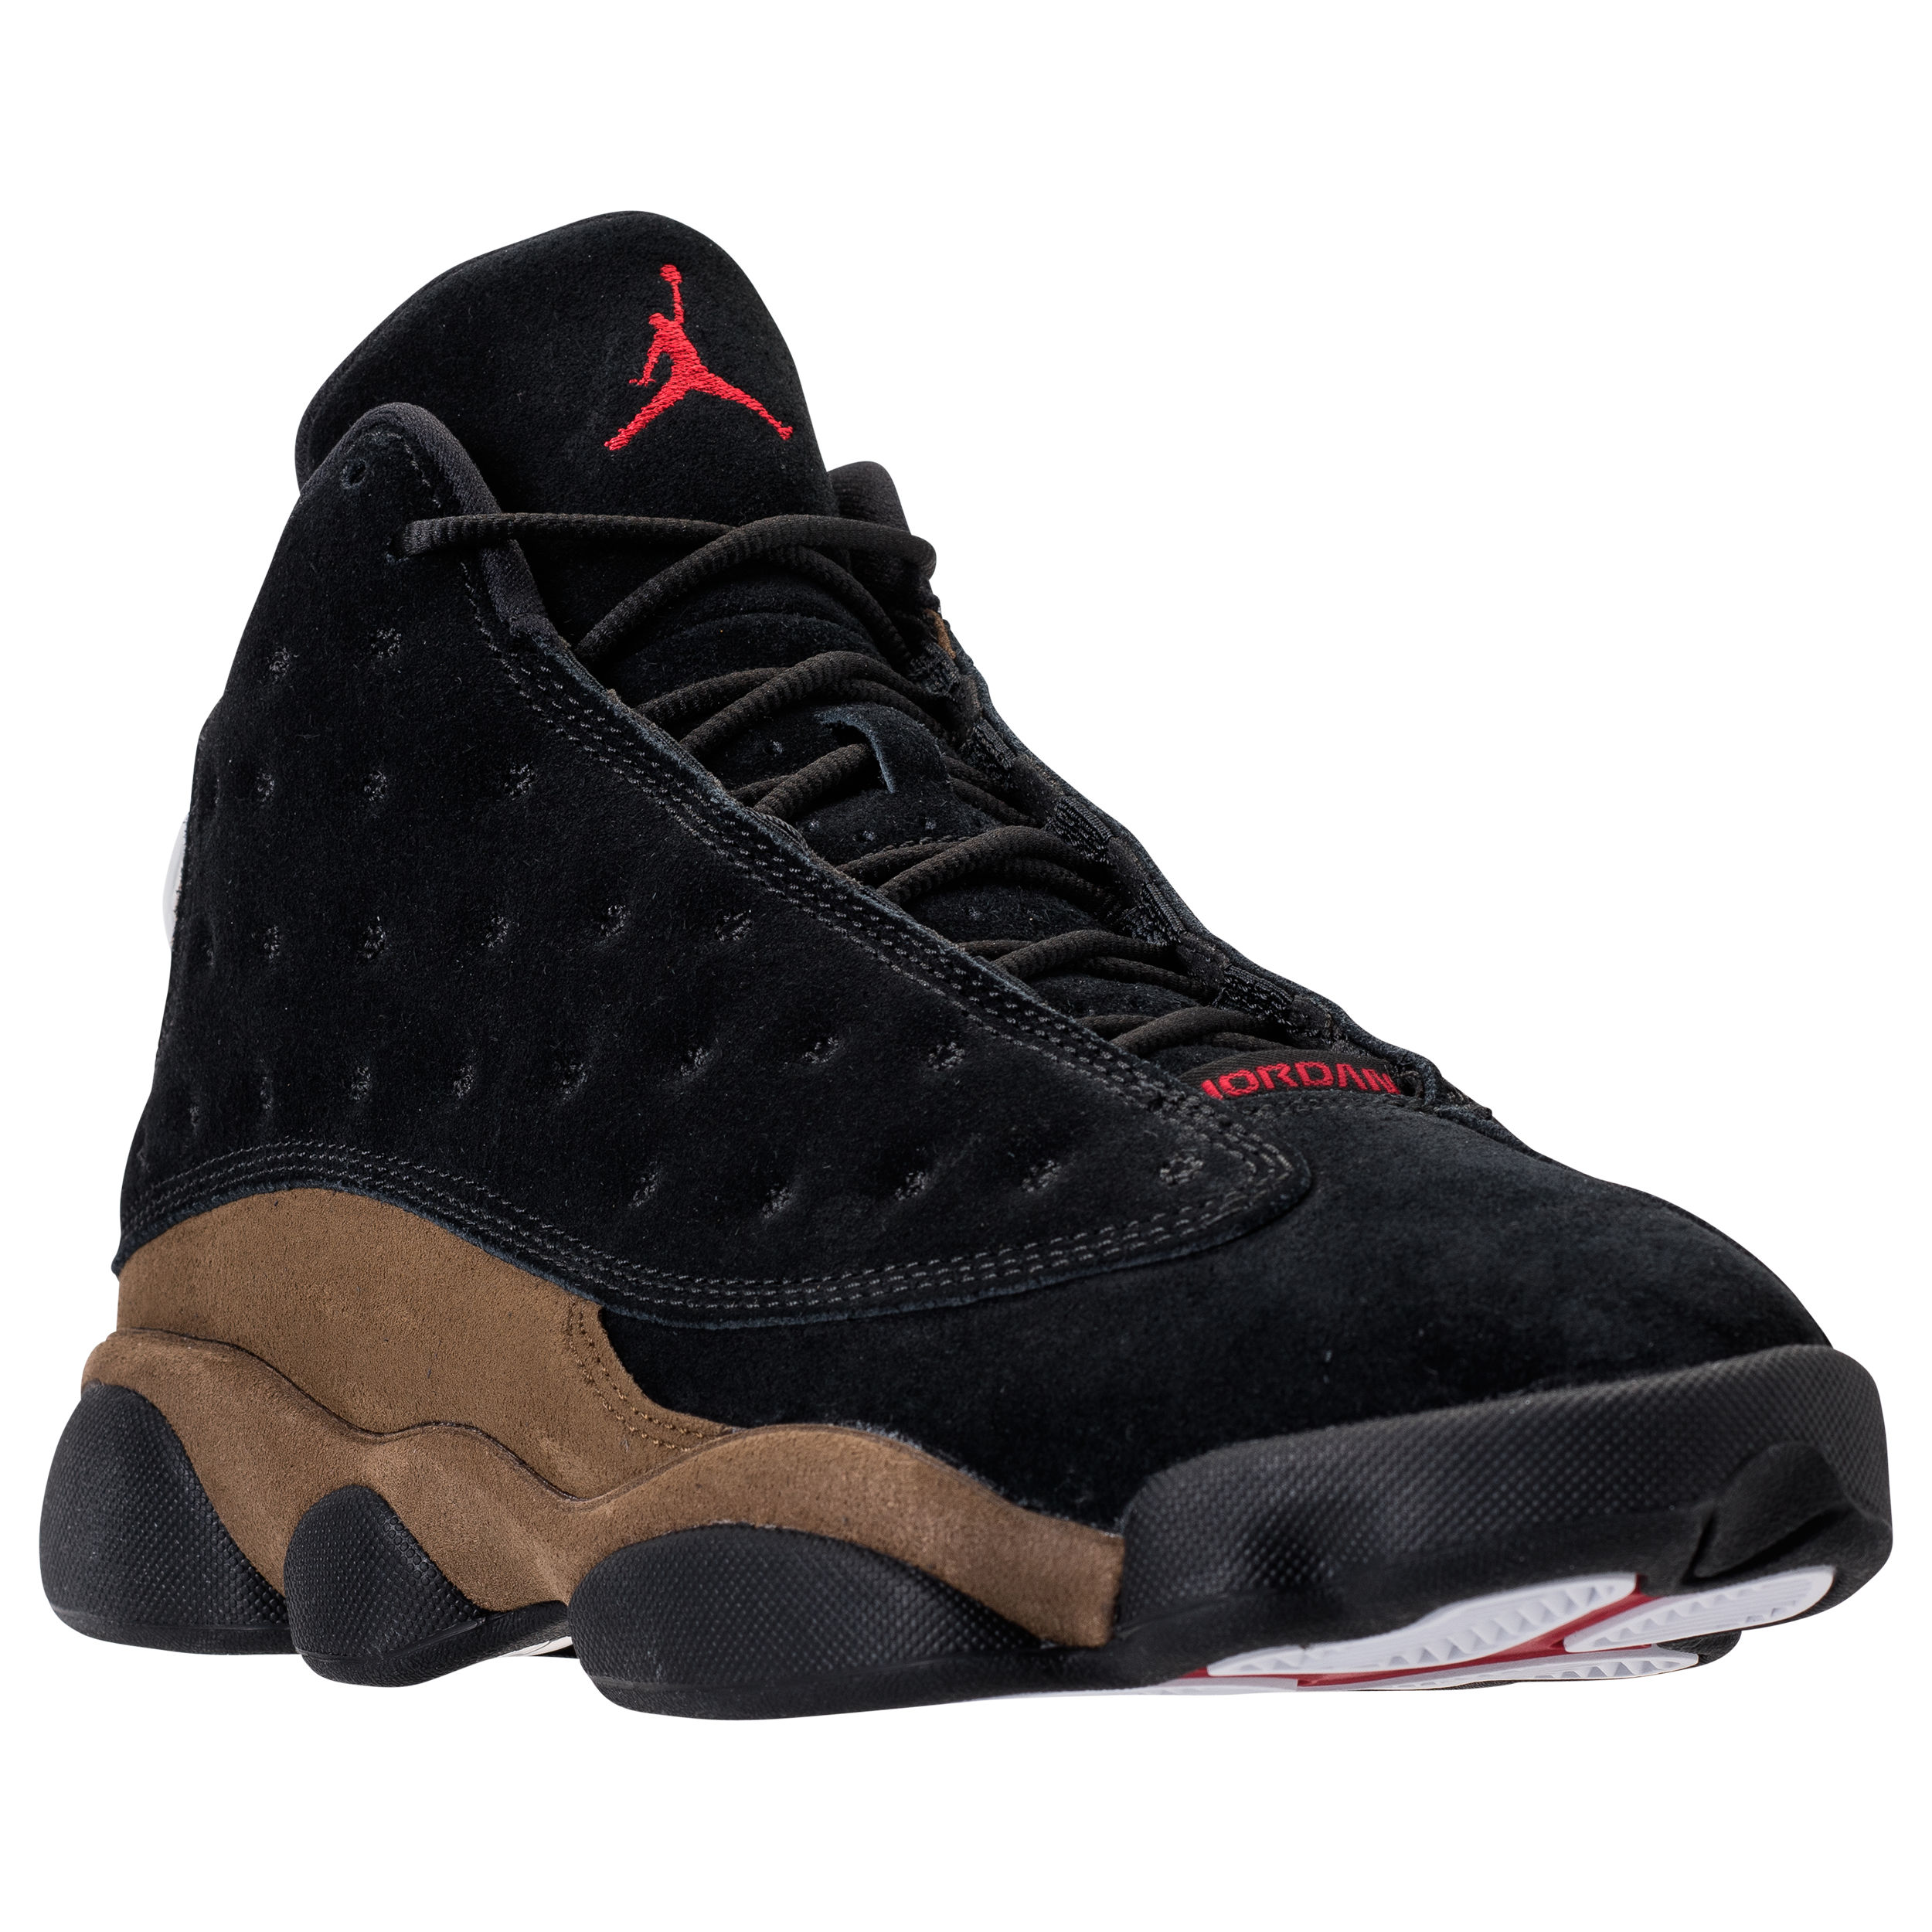 The Air Jordan 13 'Olive' Gets a